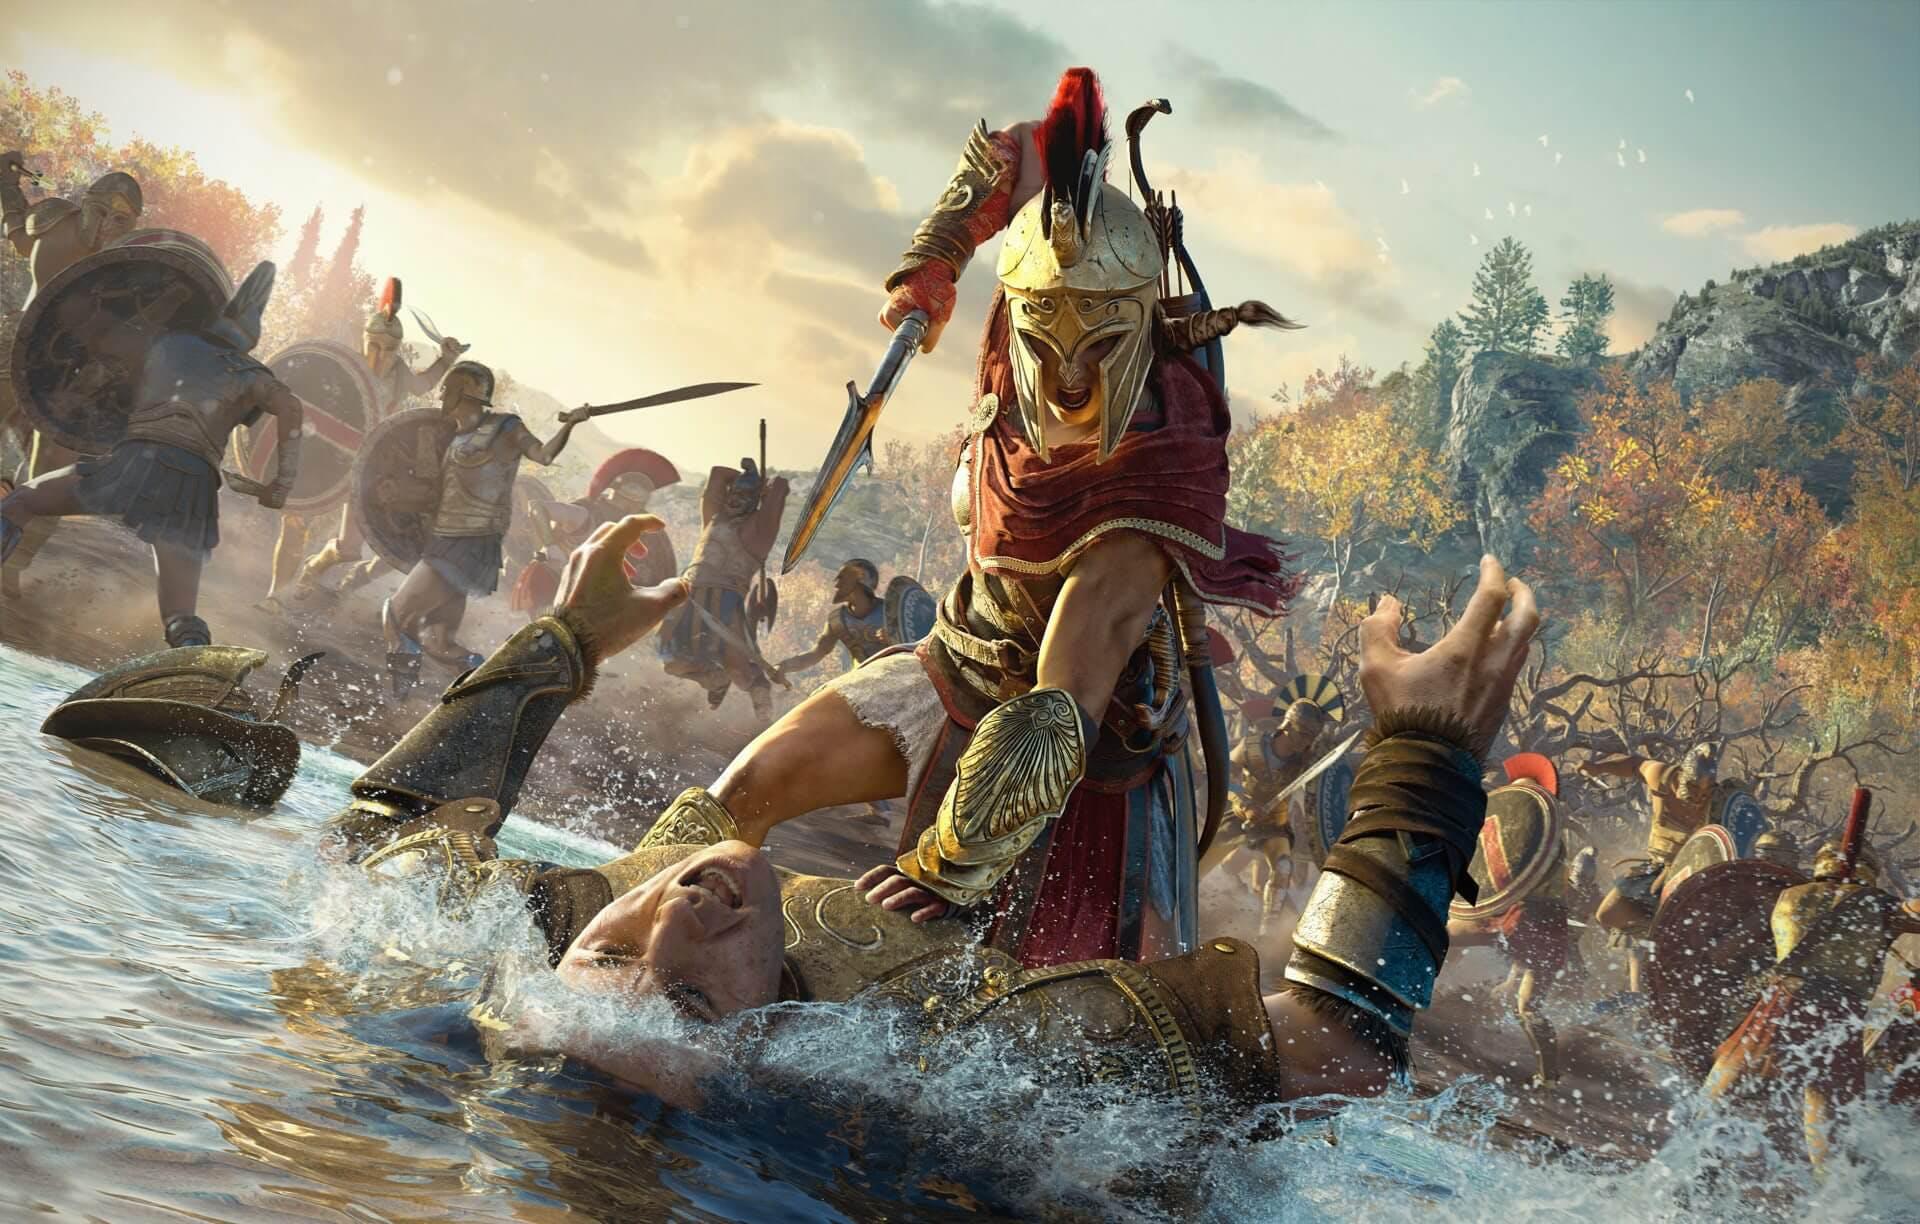 https://images.prismic.io/fanatical/1248e859-f435-49db-8178-e1c3b5448540_Assassins-Creed-Odyssey-feature-3.jpg?auto=compress,format